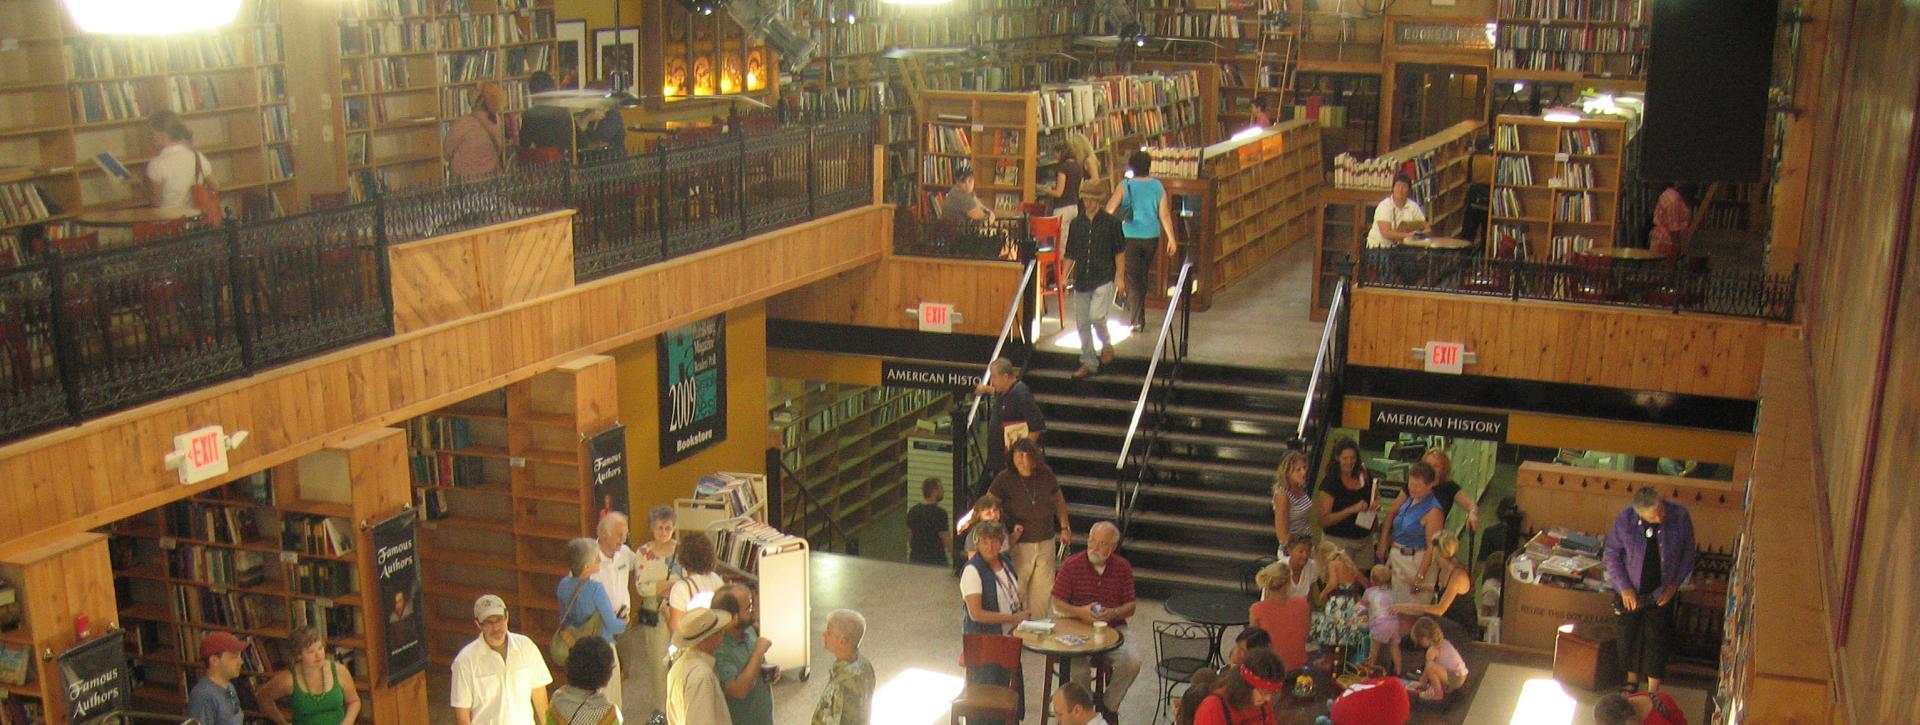 midtown-scholar-bookstore-cafe-midtown-harrisburg-rainy-day